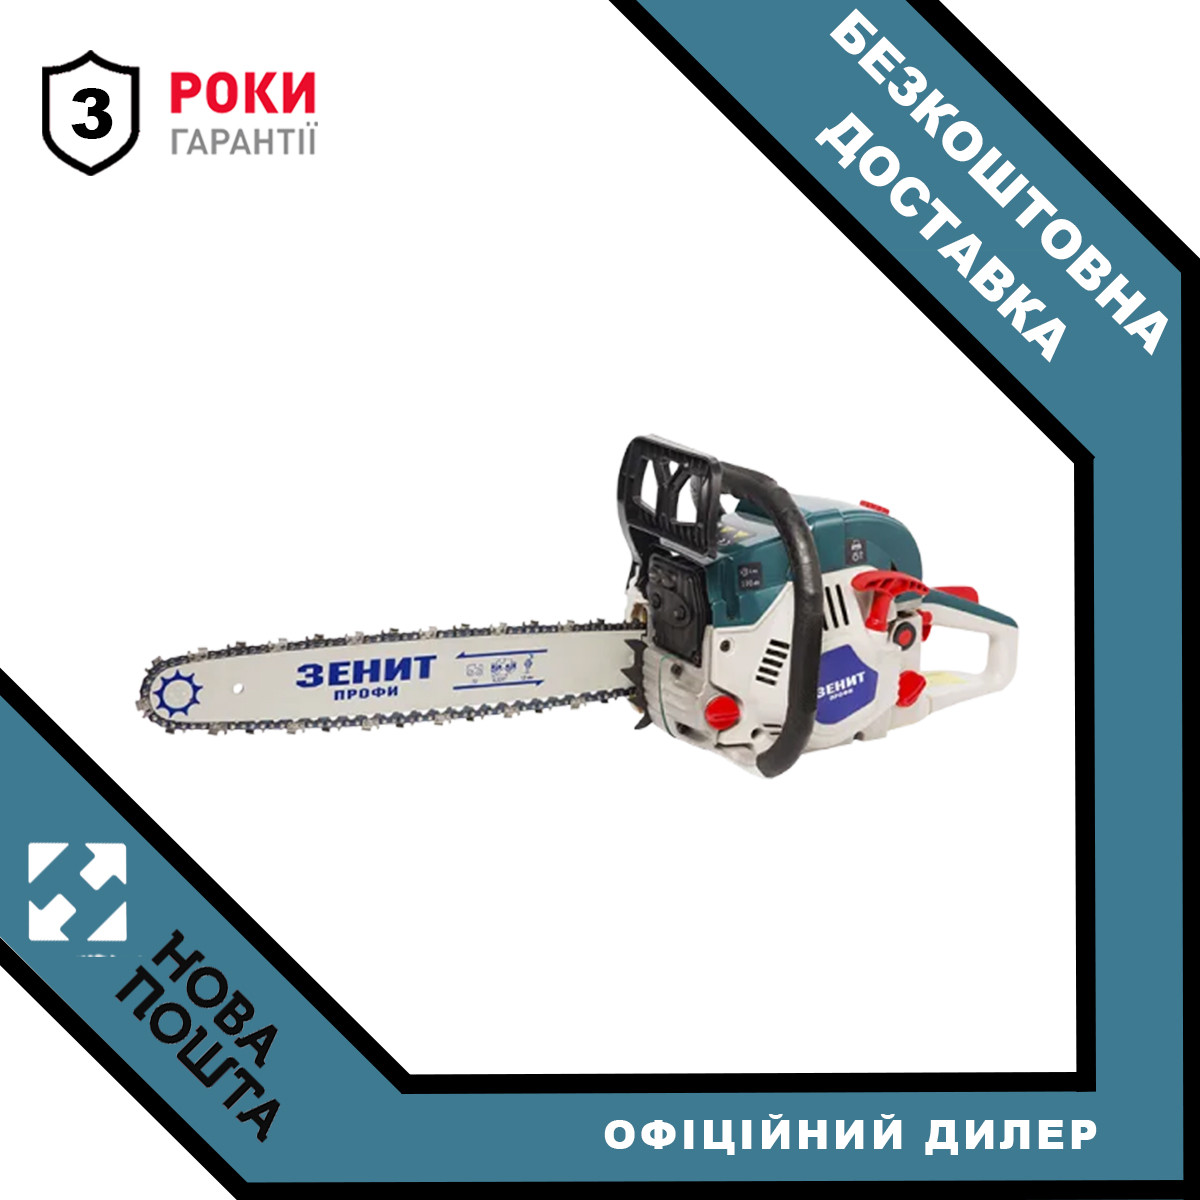 Пила бензинова ЗЕНИТ БПЛ-455/2600 Профи